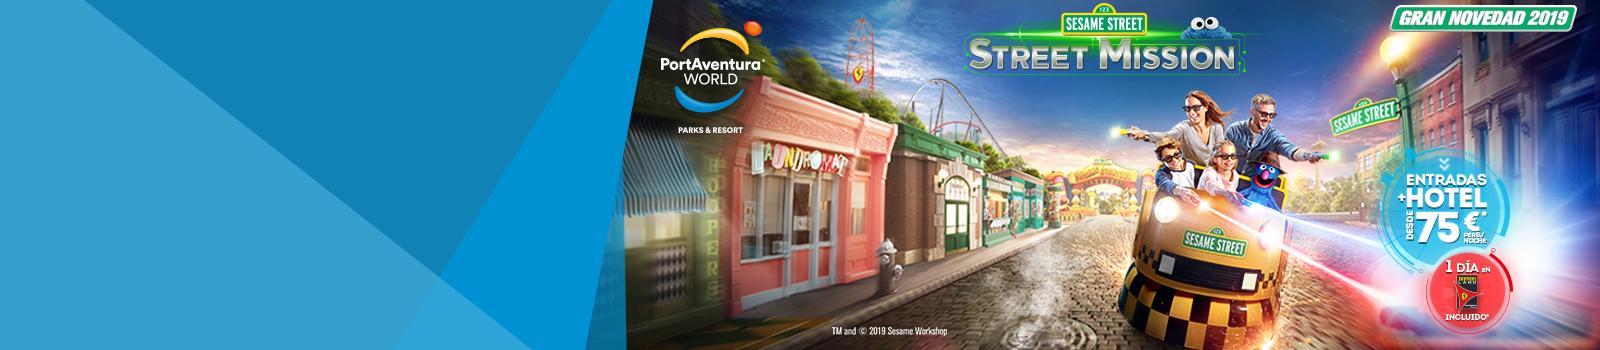 Oferta Hoteles PortAventura